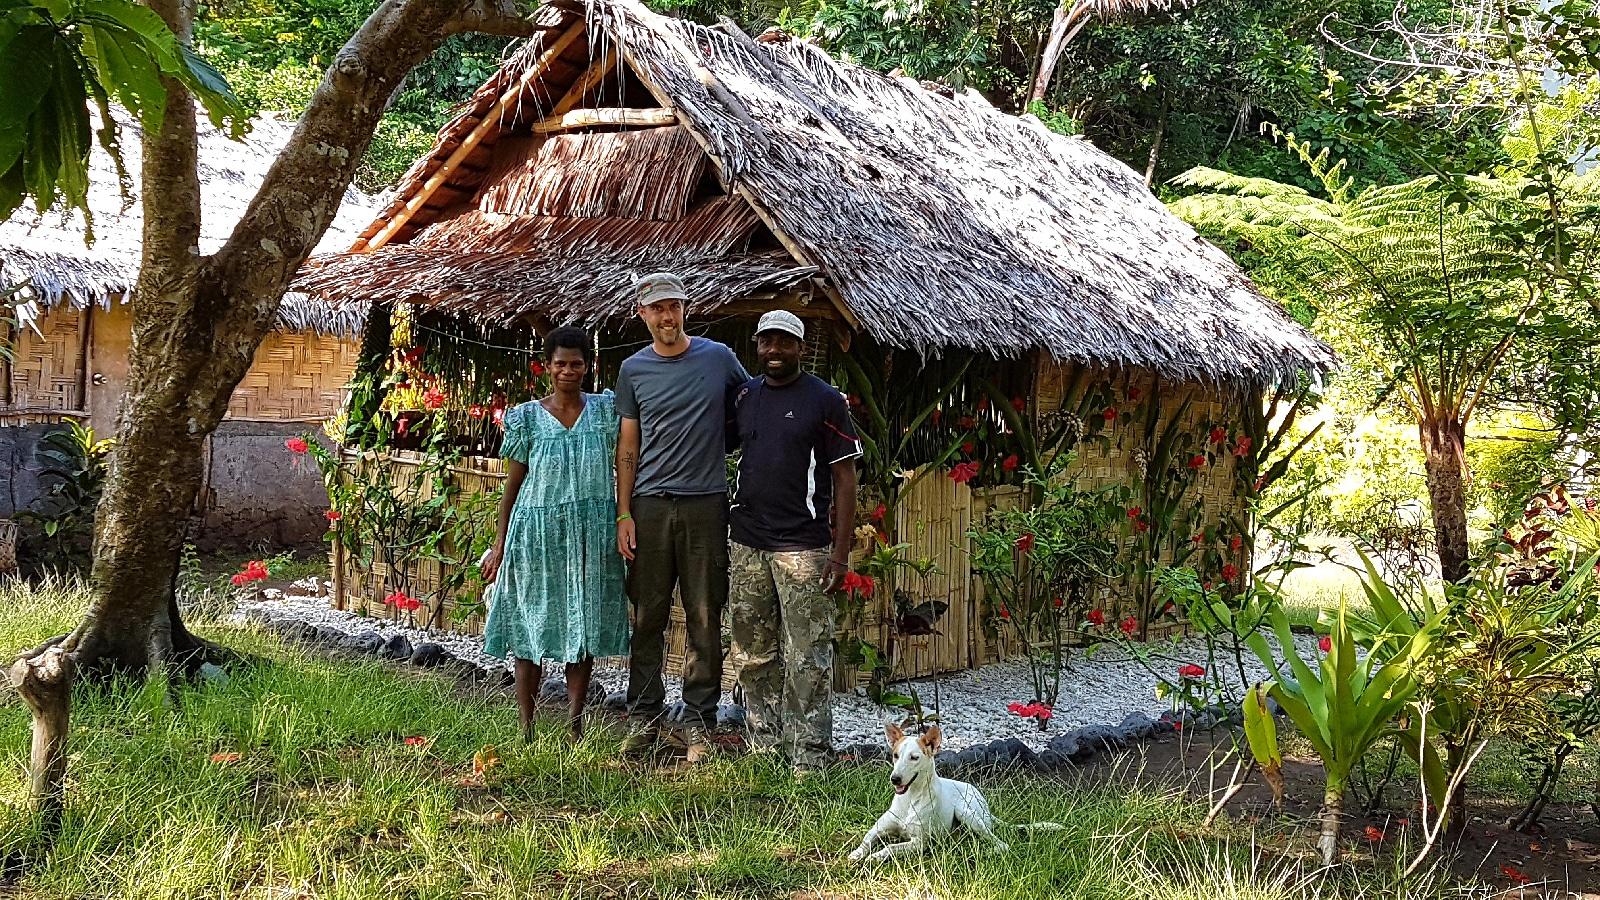 Accueil sur l'île d'Ambrym, Vanuatu.